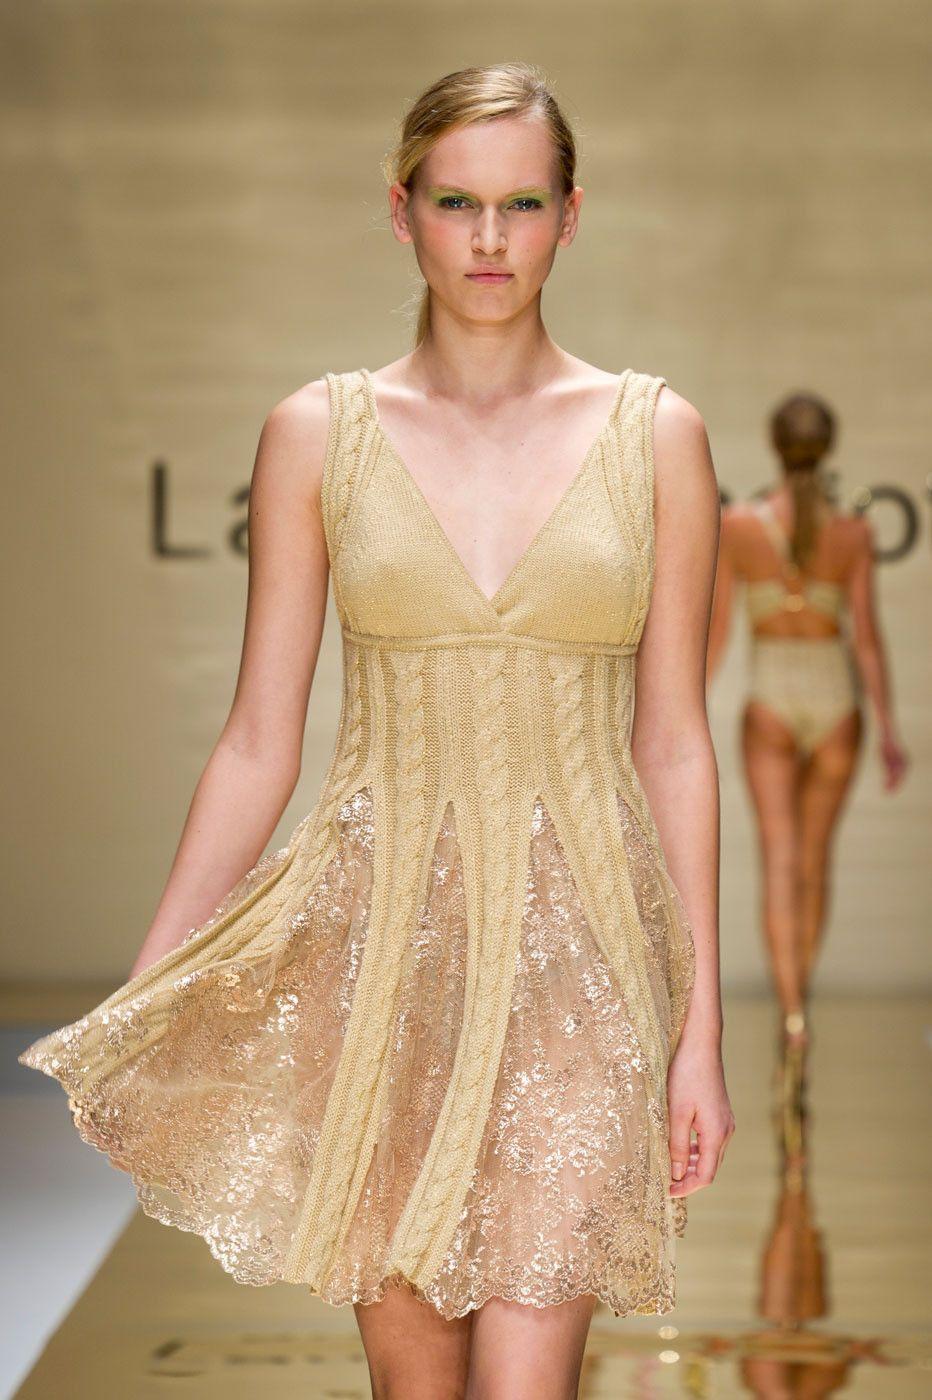 Laura Biagiotti at Milan Fashion Week Spring 2012.